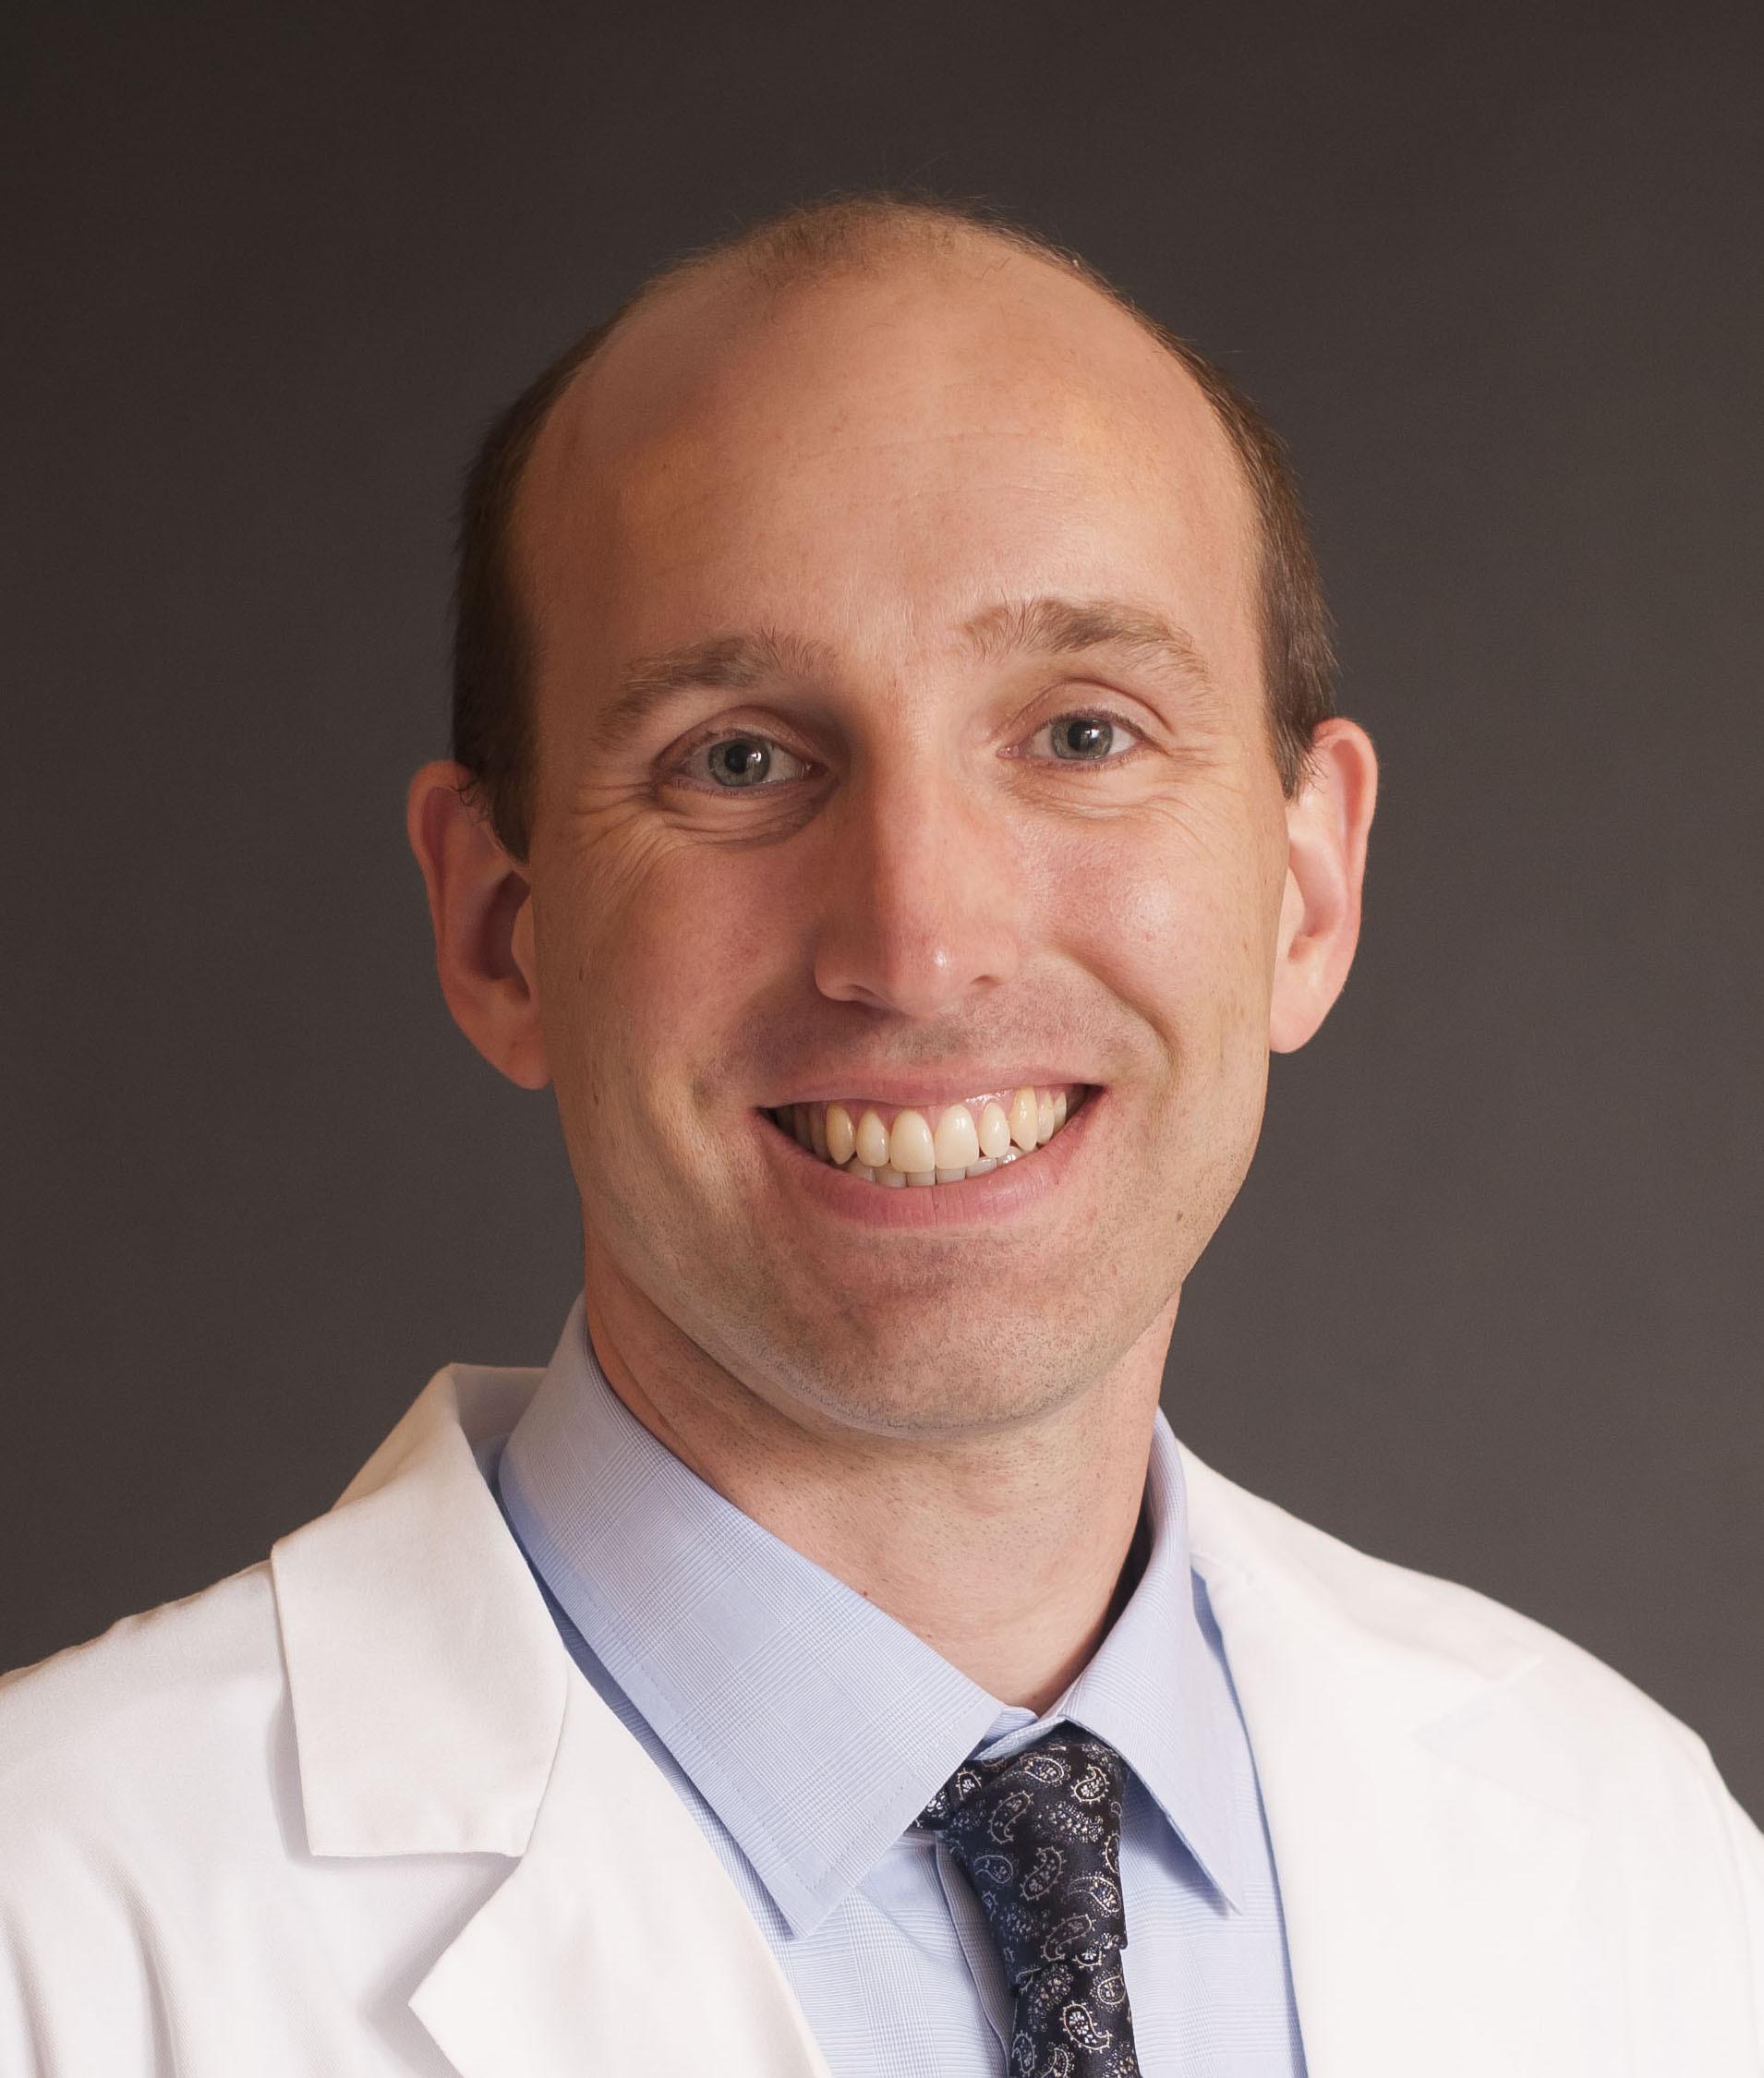 Mark Benson, MD, PhD's avatar